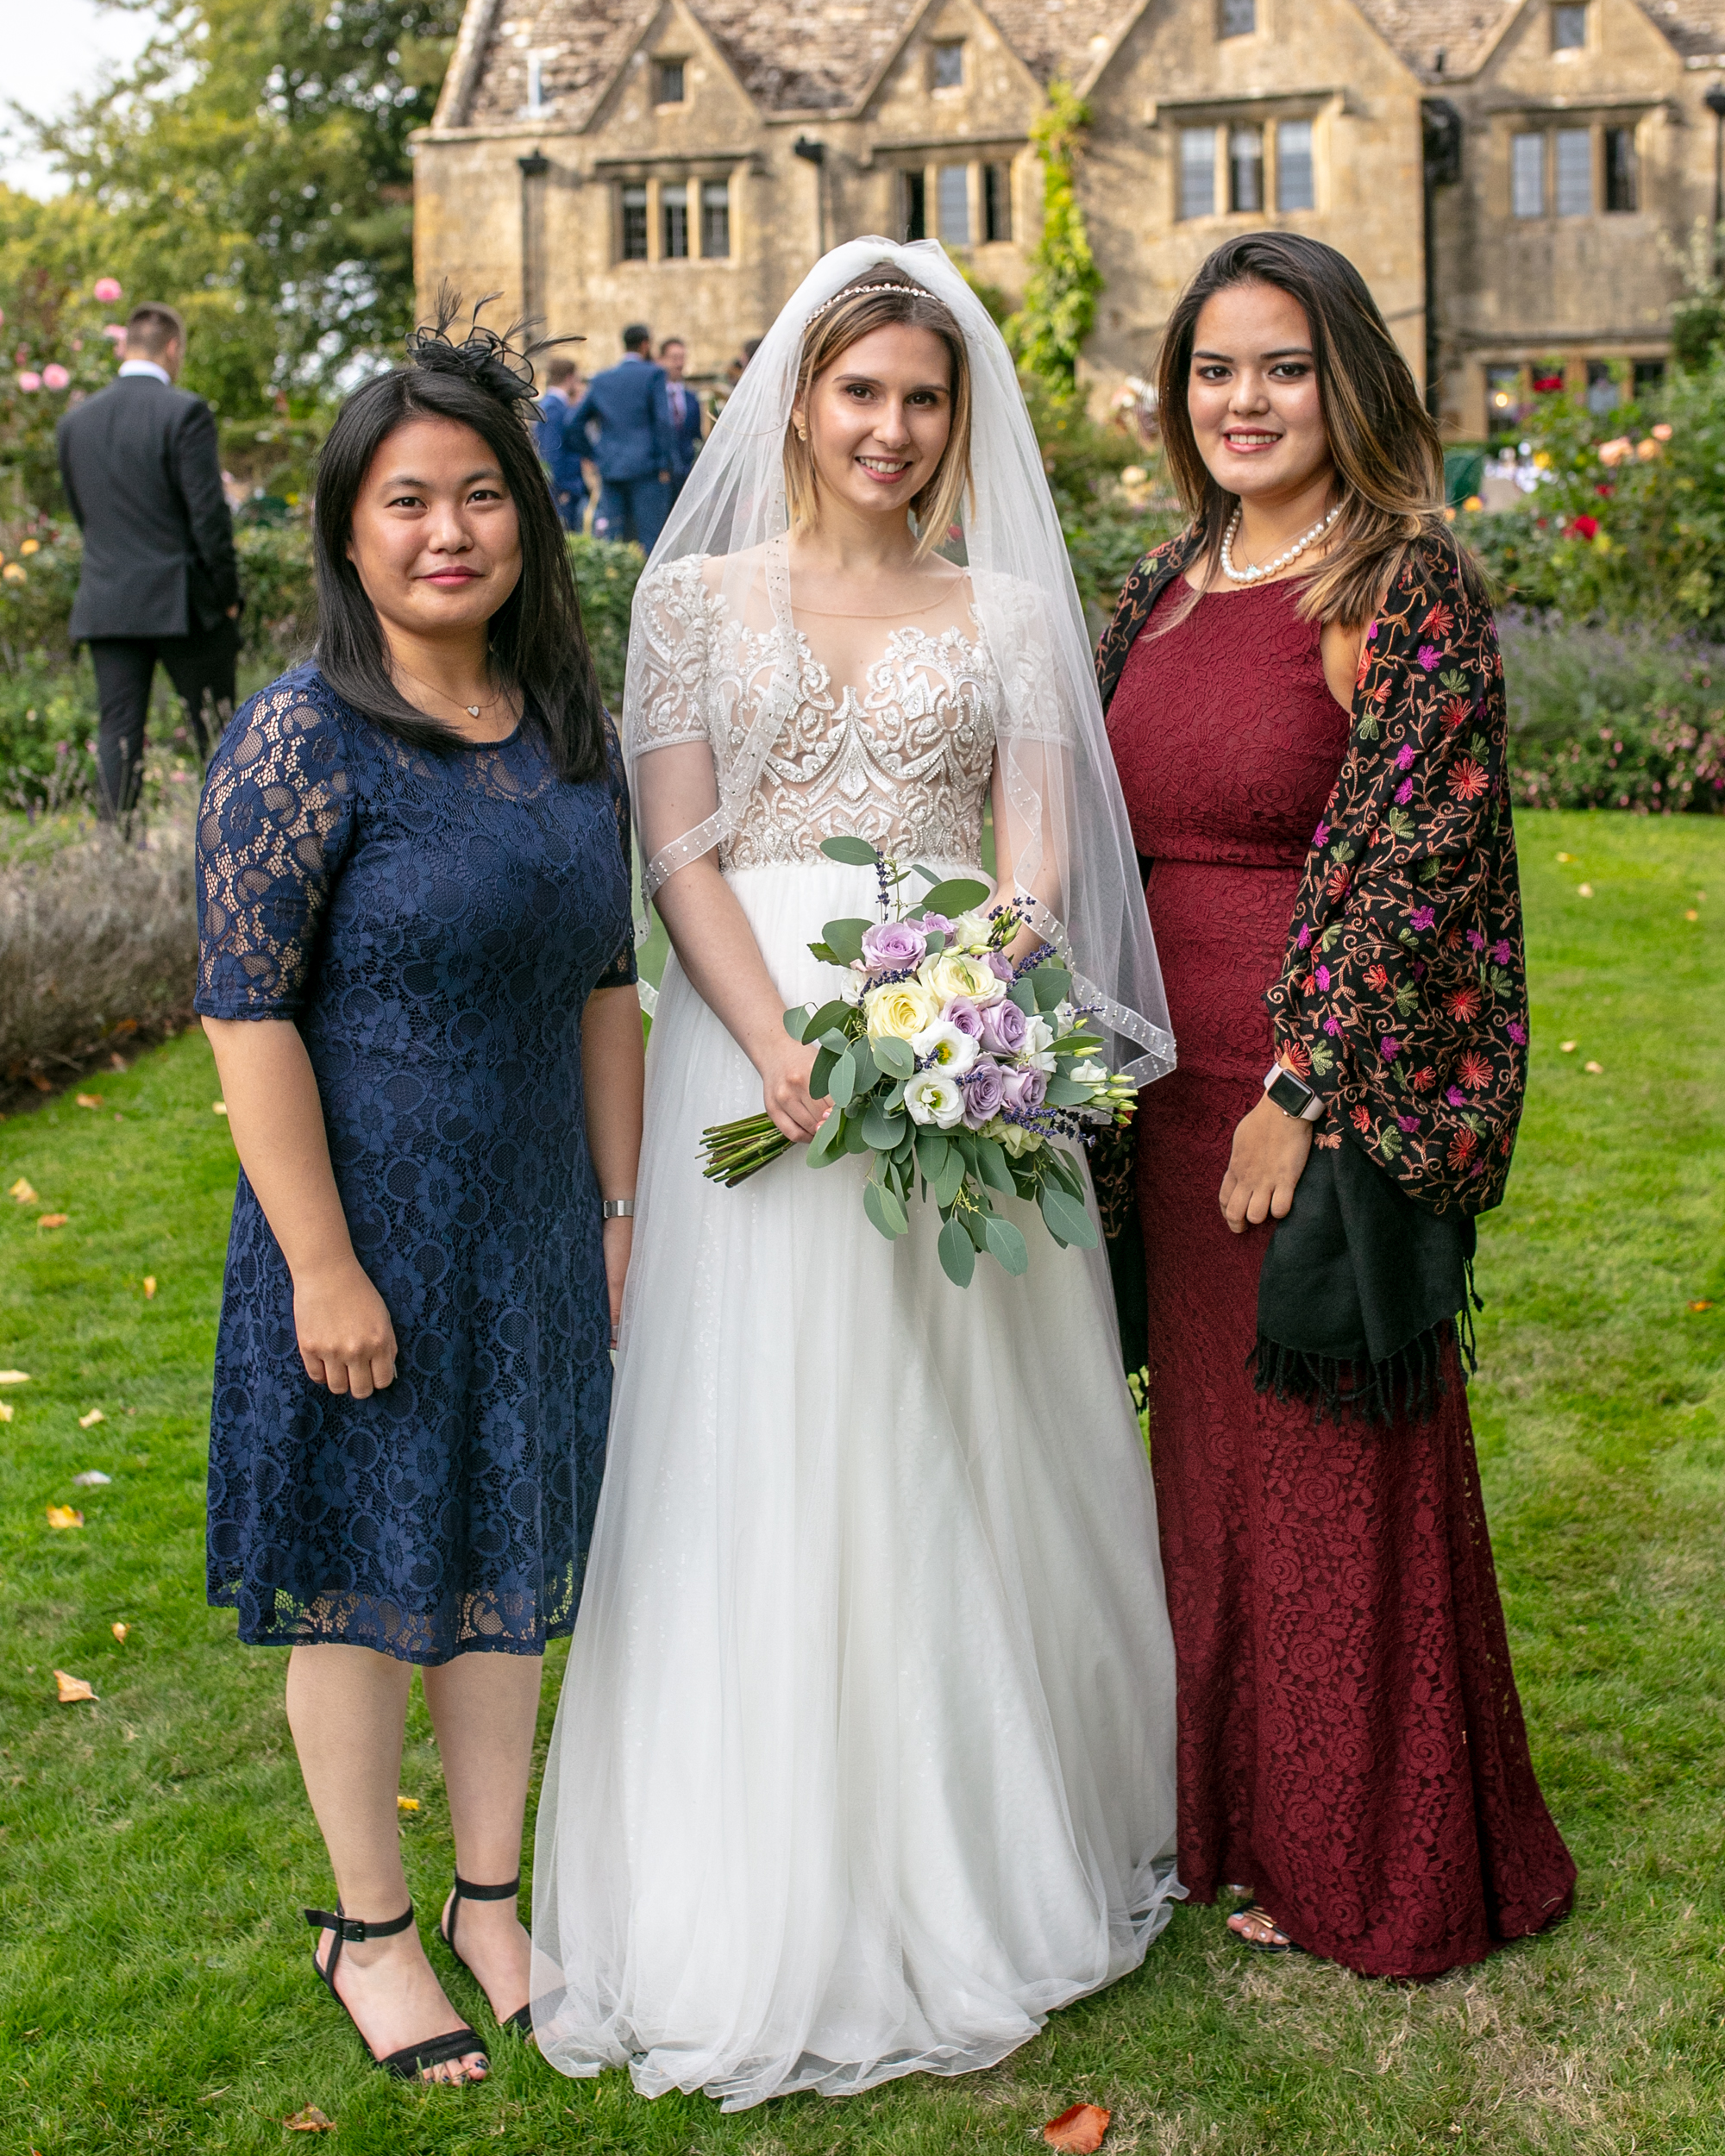 Charringworth-Manor-Wedding-Photography31.jpg